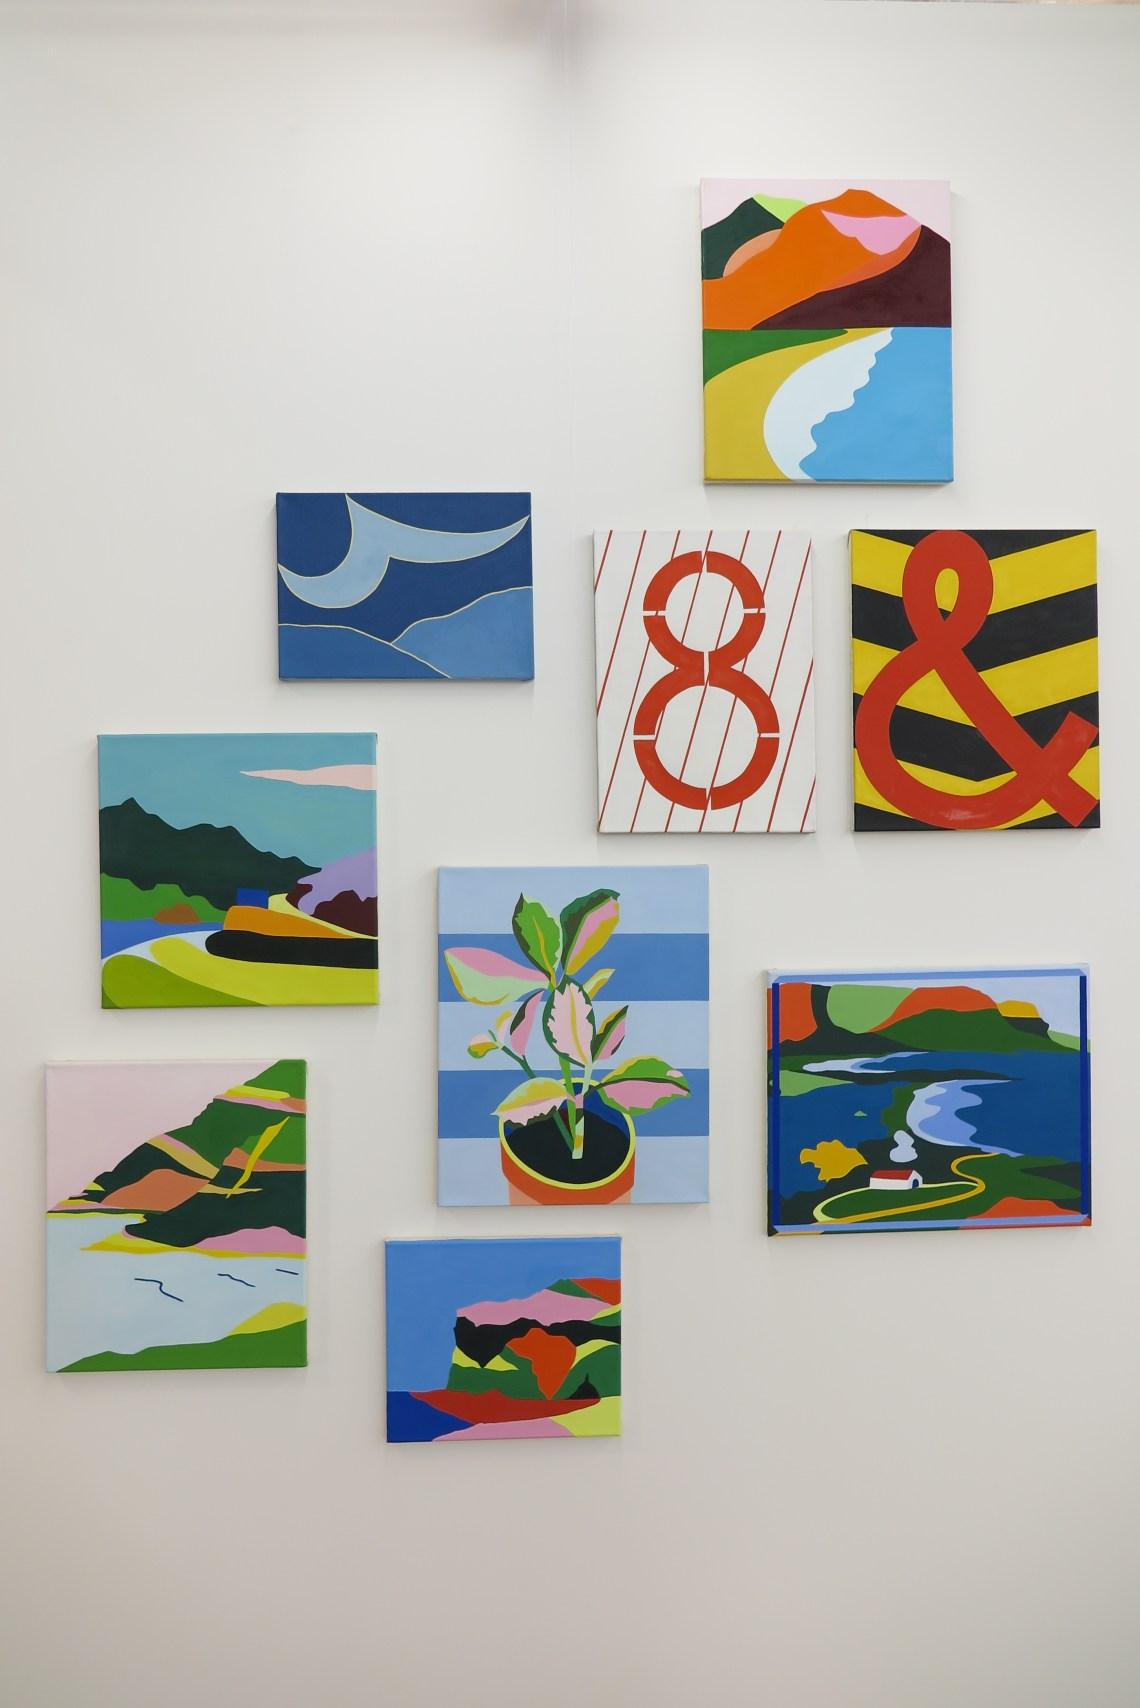 Galerie: Pablo's Birthday. Kunstenaar: Tessa Perutz  (Main)